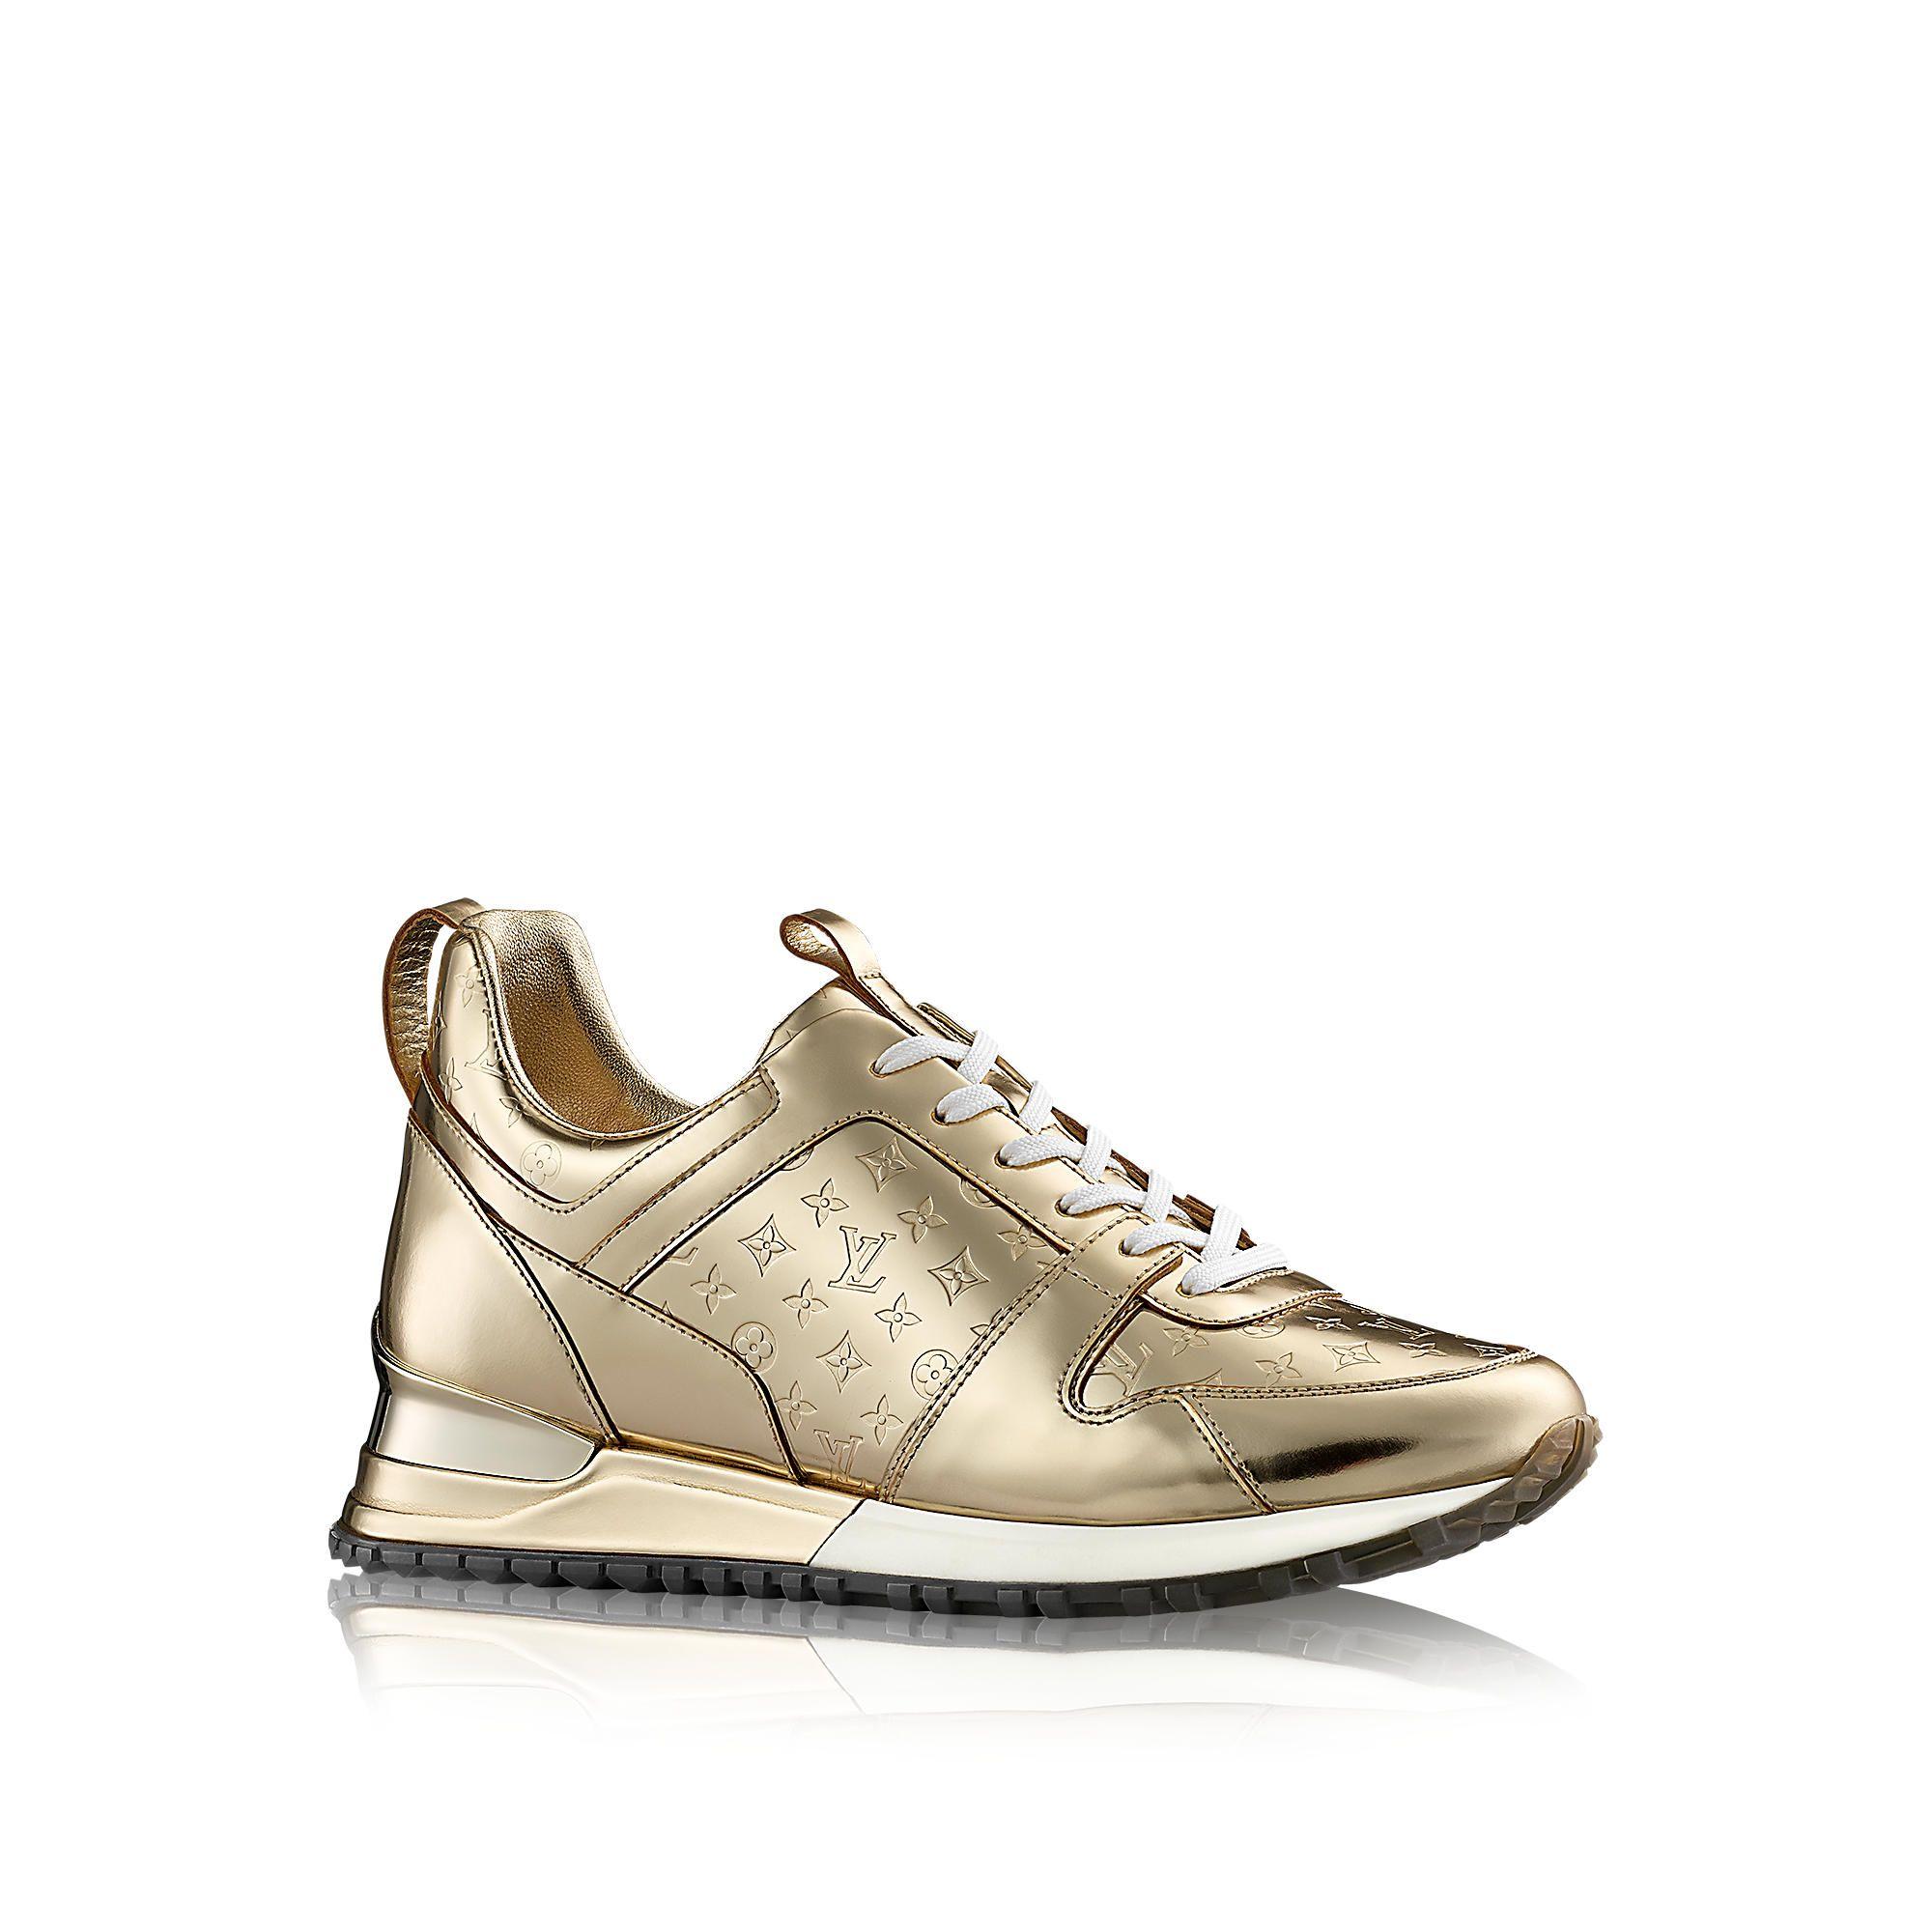 louis vuitton shoes 2017. نتيجة بحث الصور عن louis winter summer shoes sneakers 2017 2018 woman\u200f vuitton